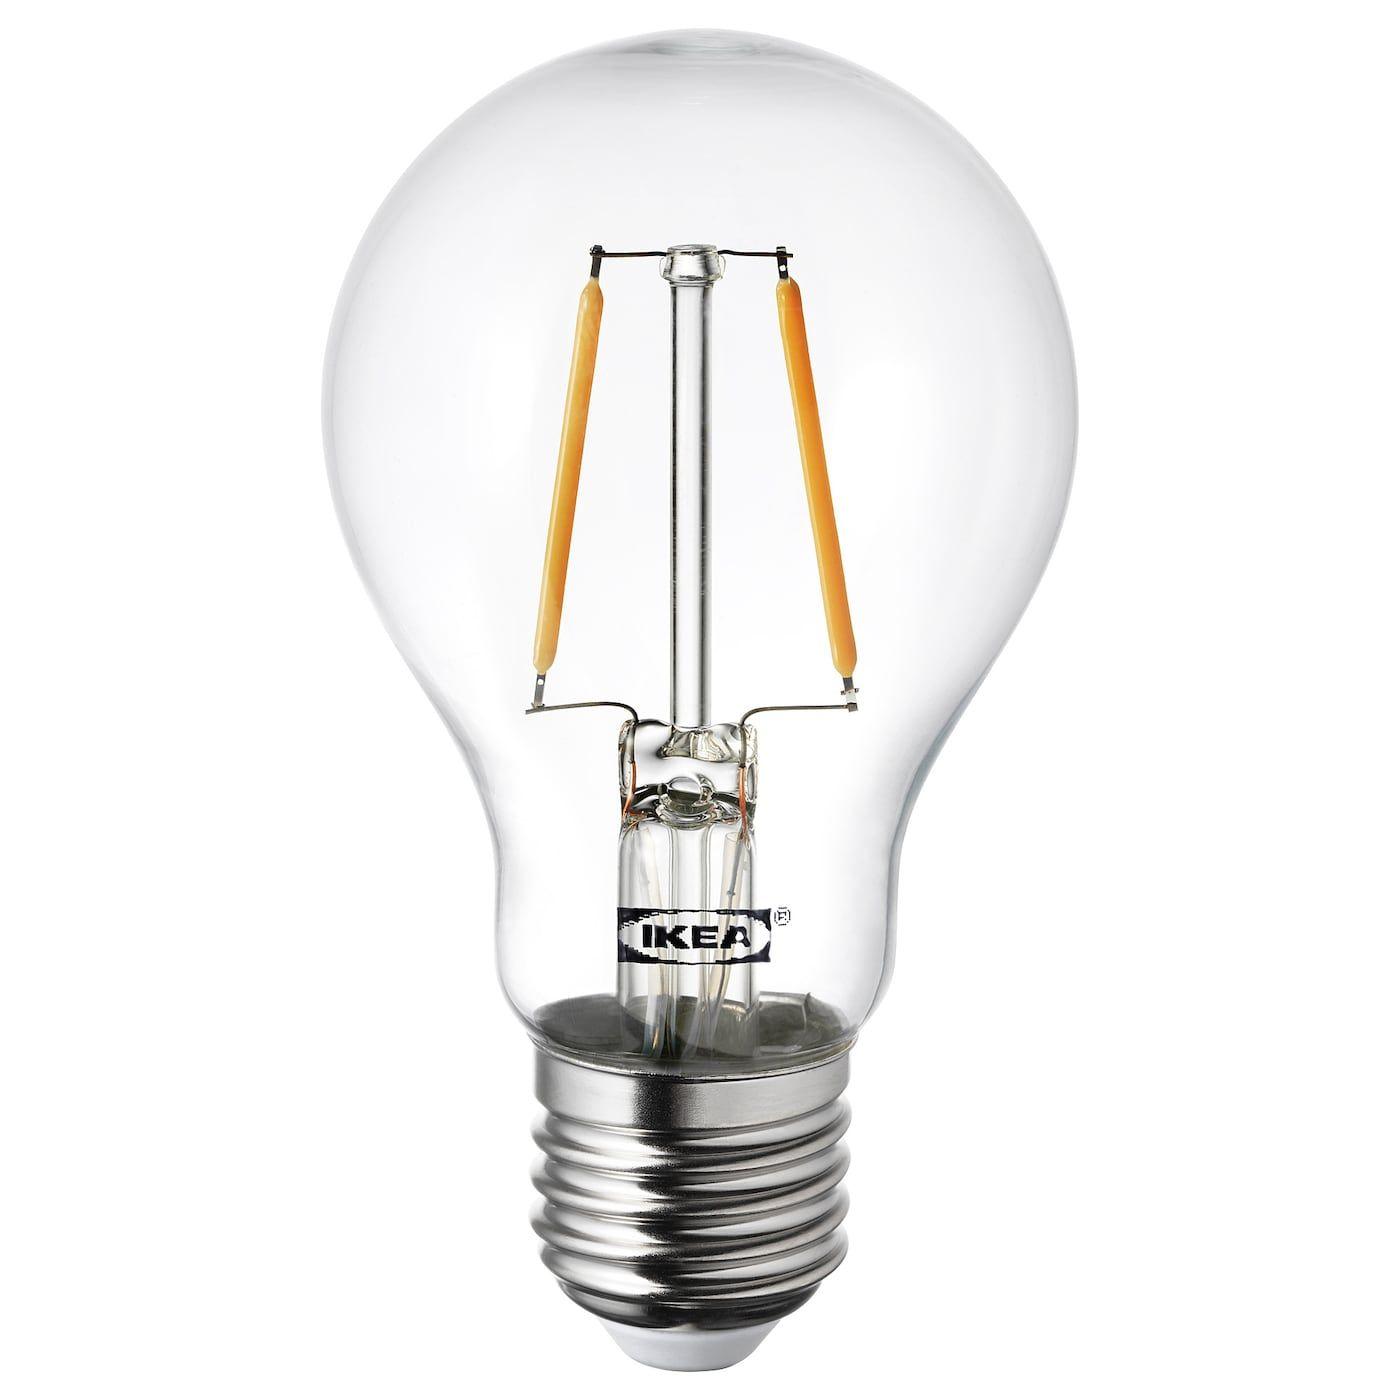 LUNNOM globe clear, LED bulb E27 100